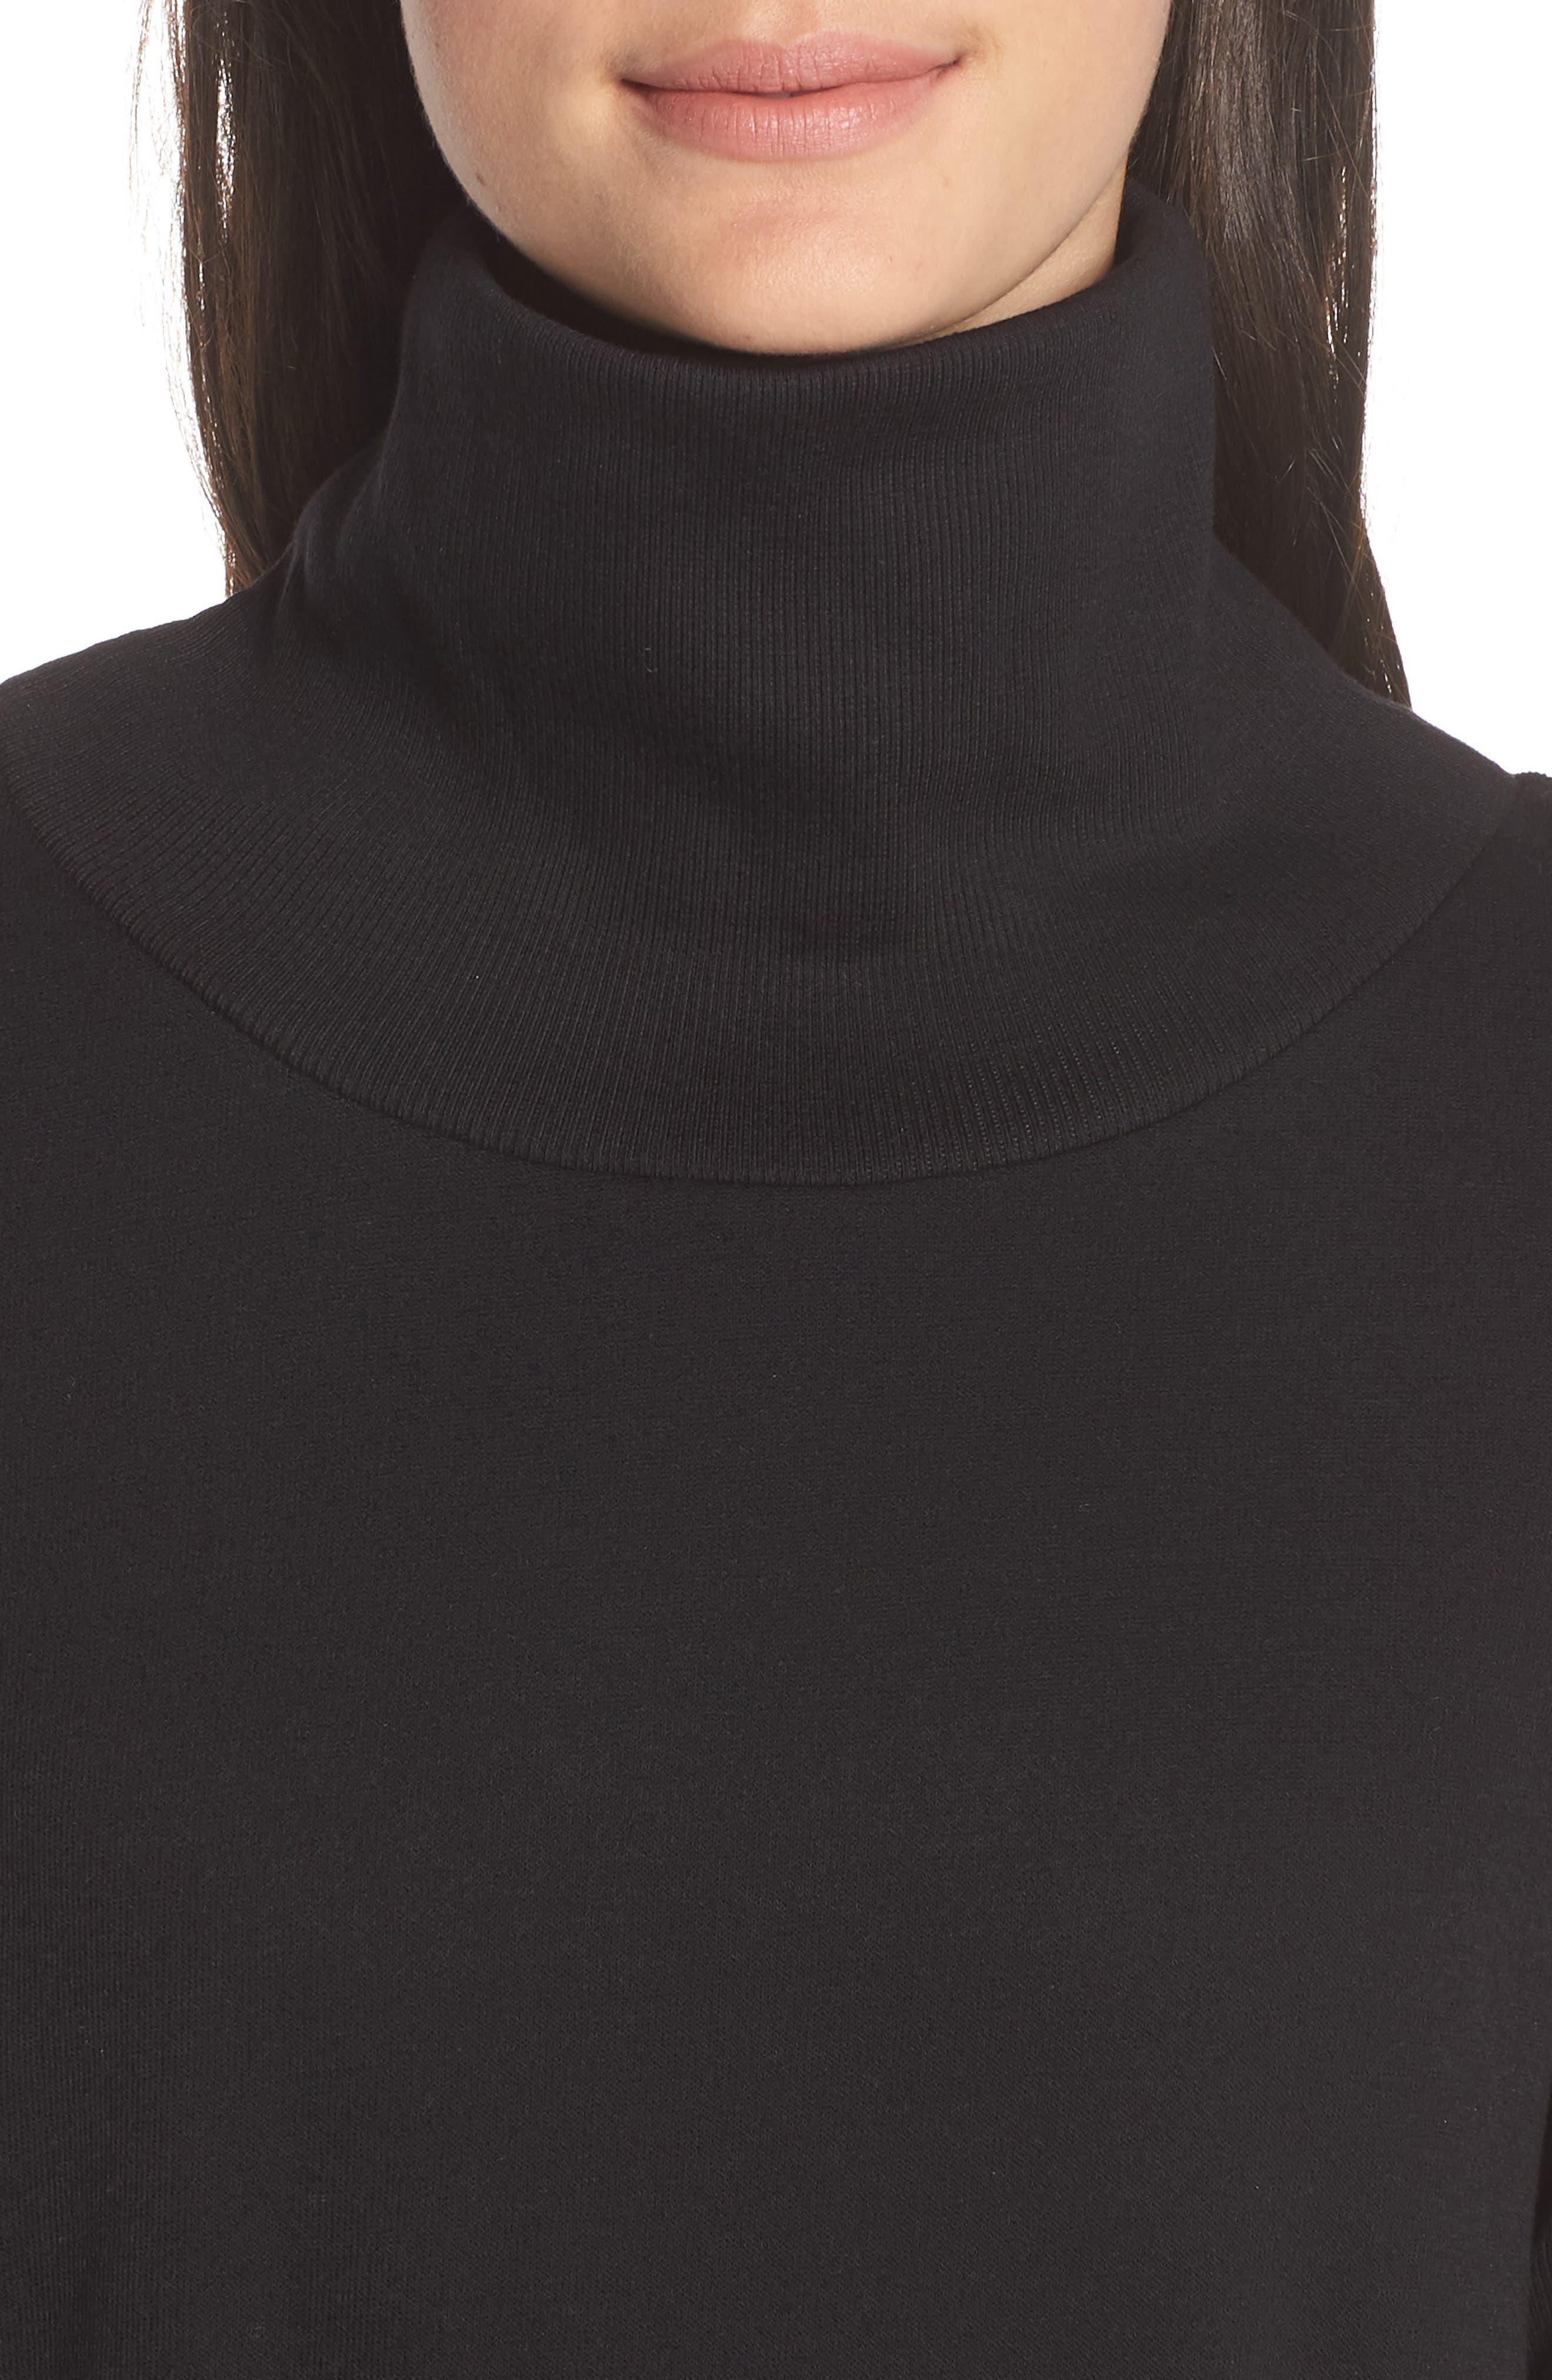 ALO, Clarity Long Sleeve Sweatshirt, Alternate thumbnail 5, color, BLACK